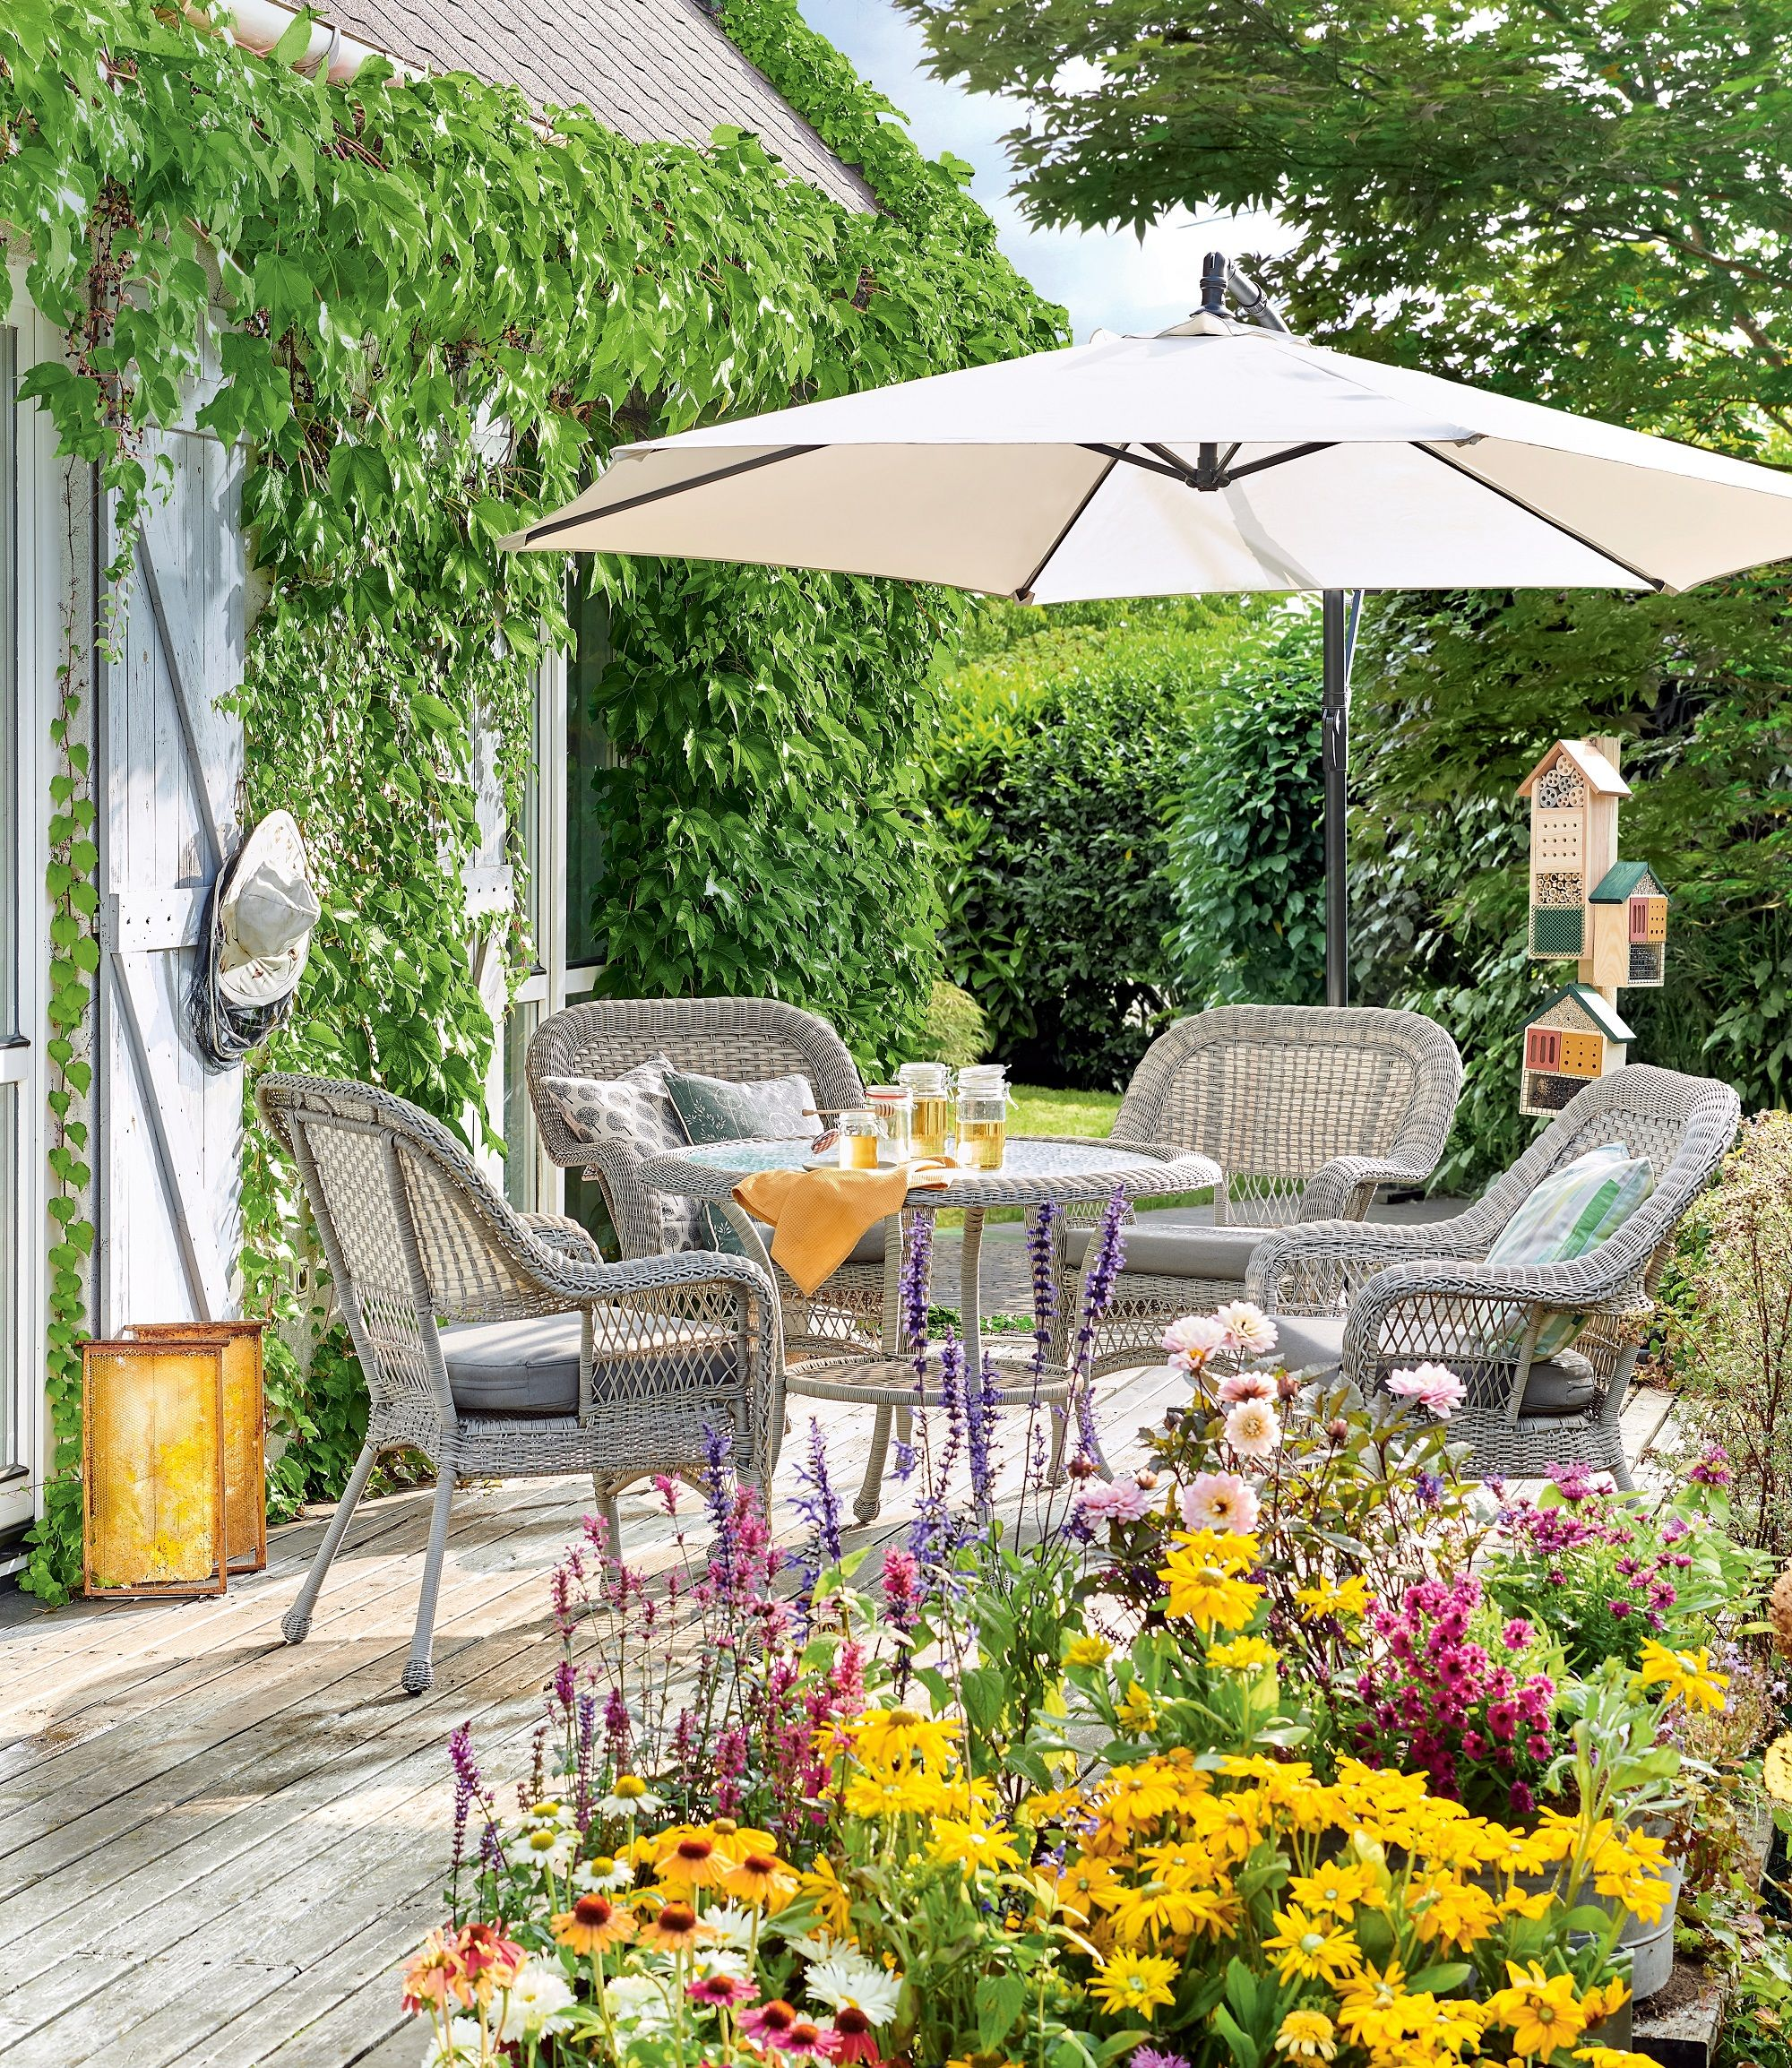 Kwietna Laka W Roli Glownej Outdoor Furniture Sets Patio Outdoor Decor